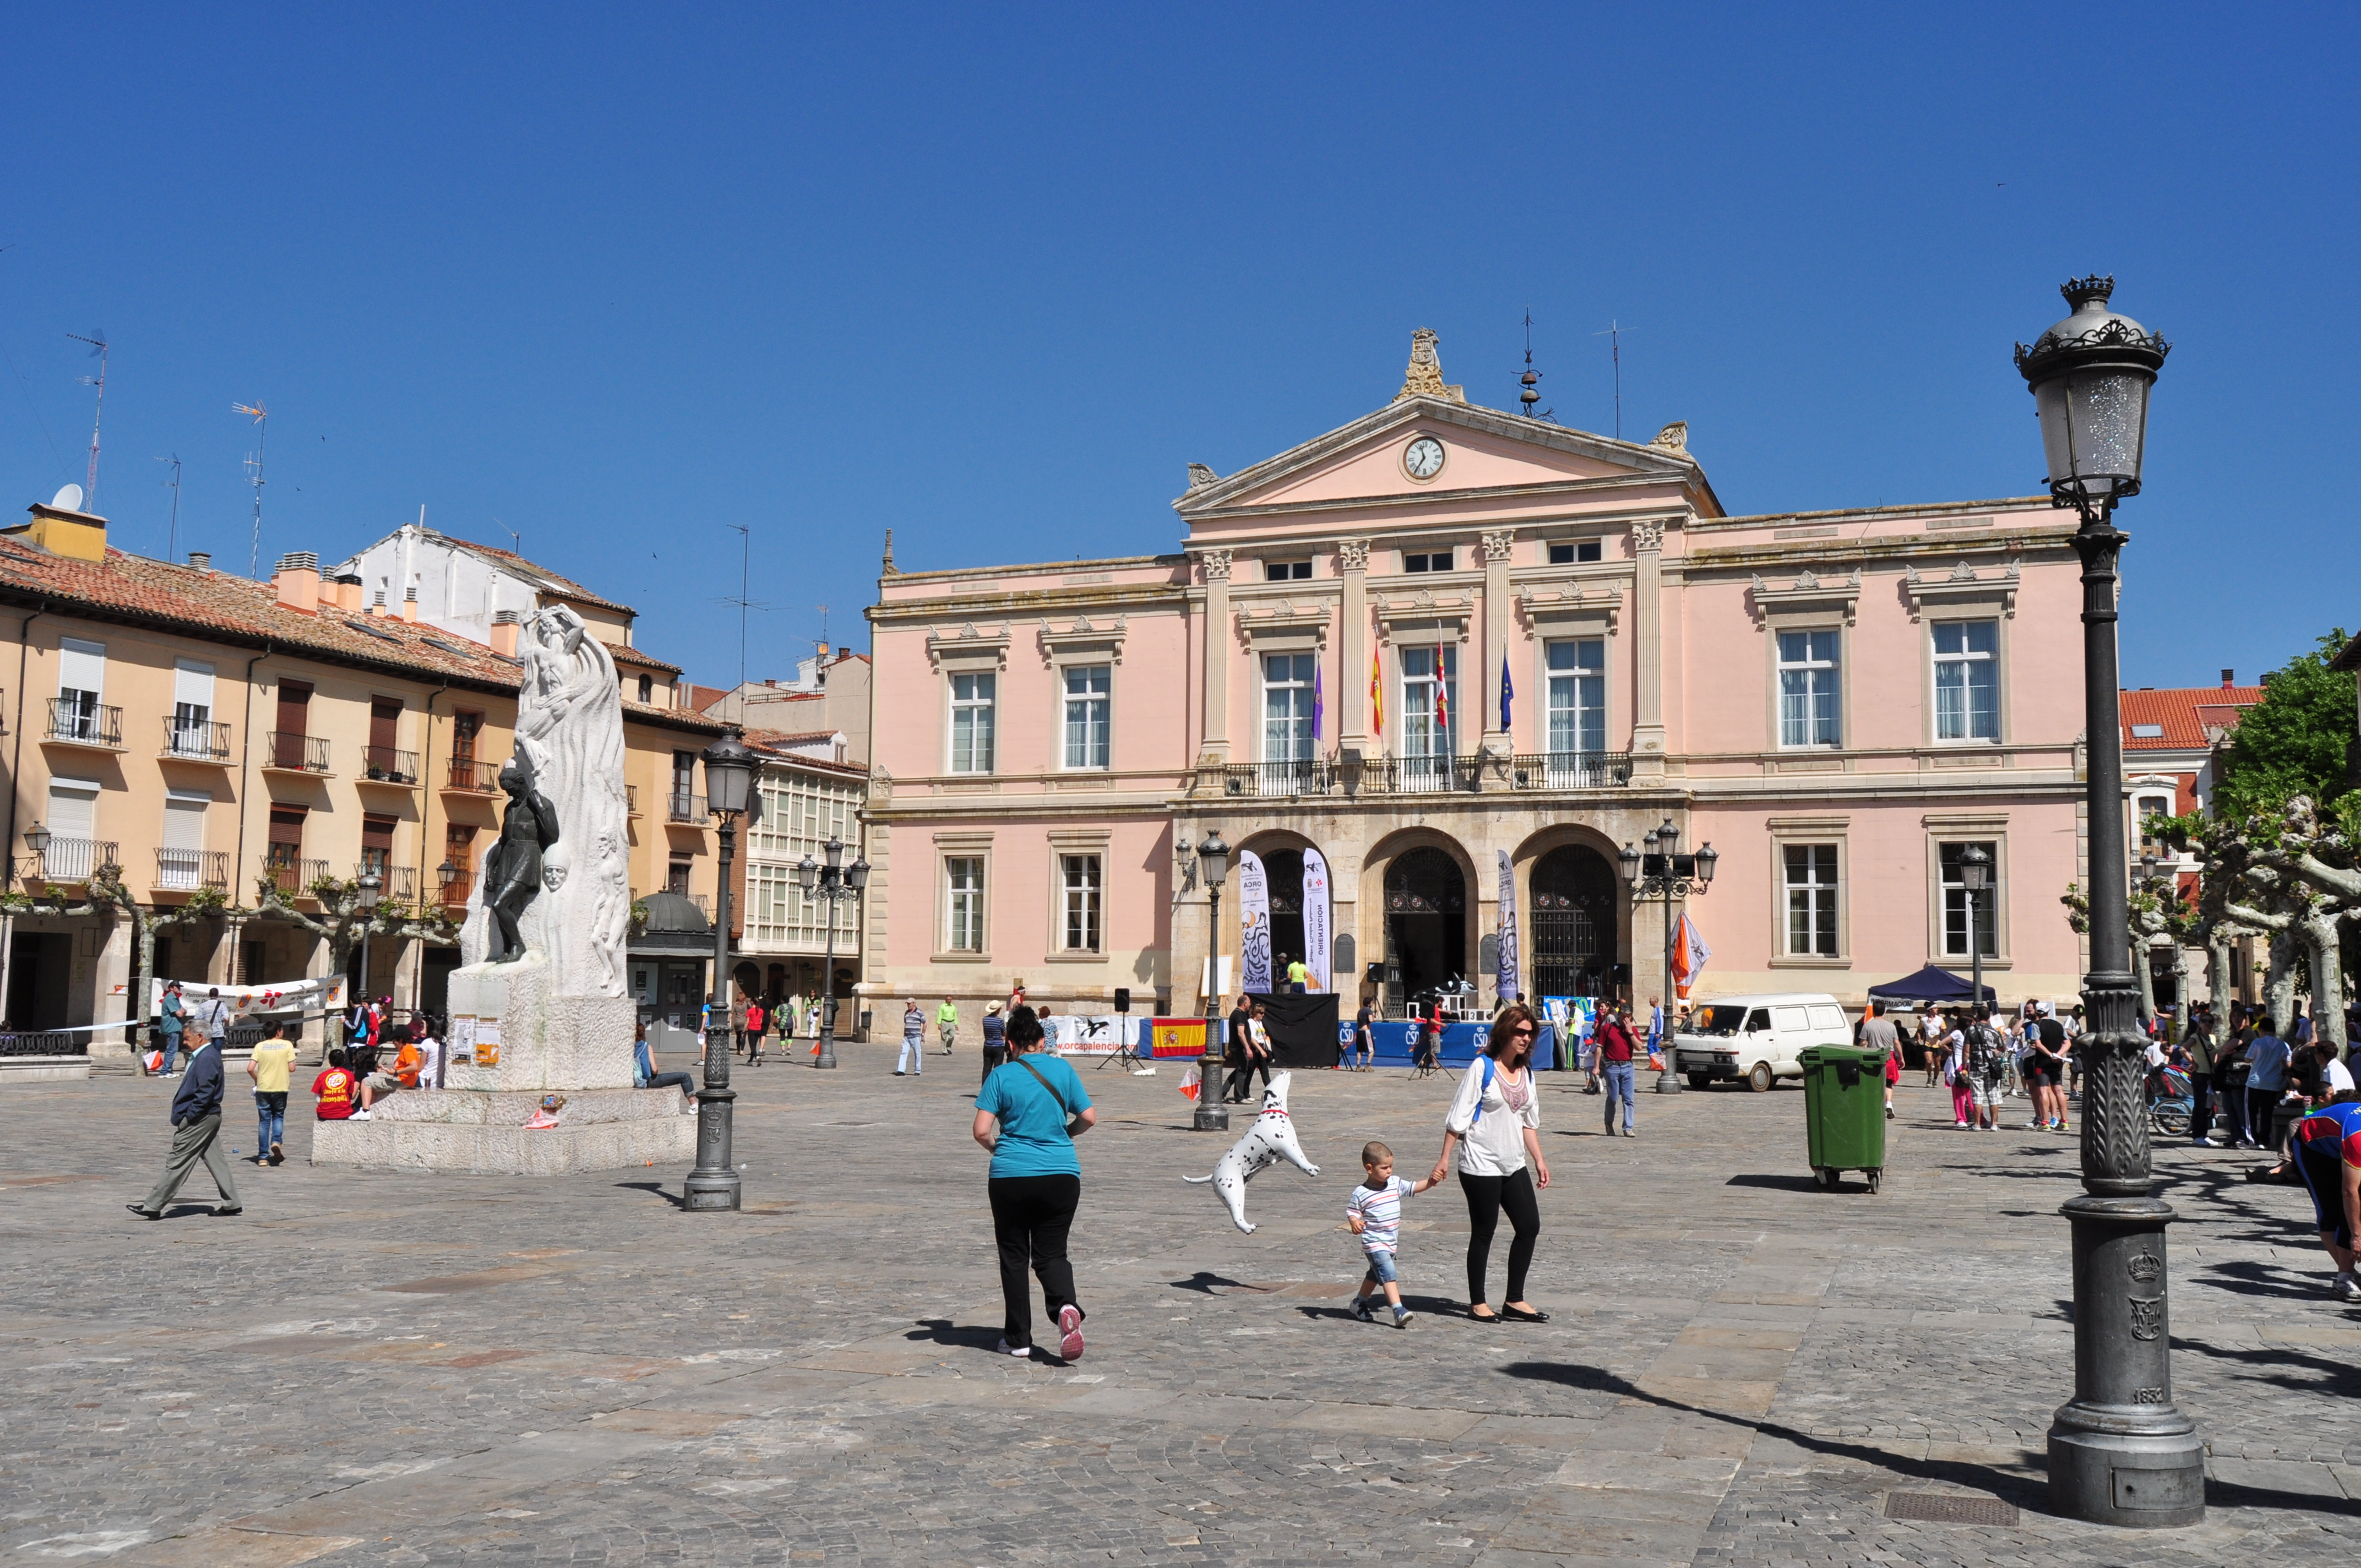 File:Palencia Capital - 013 (41109427041).jpg - Wikimedia Commons